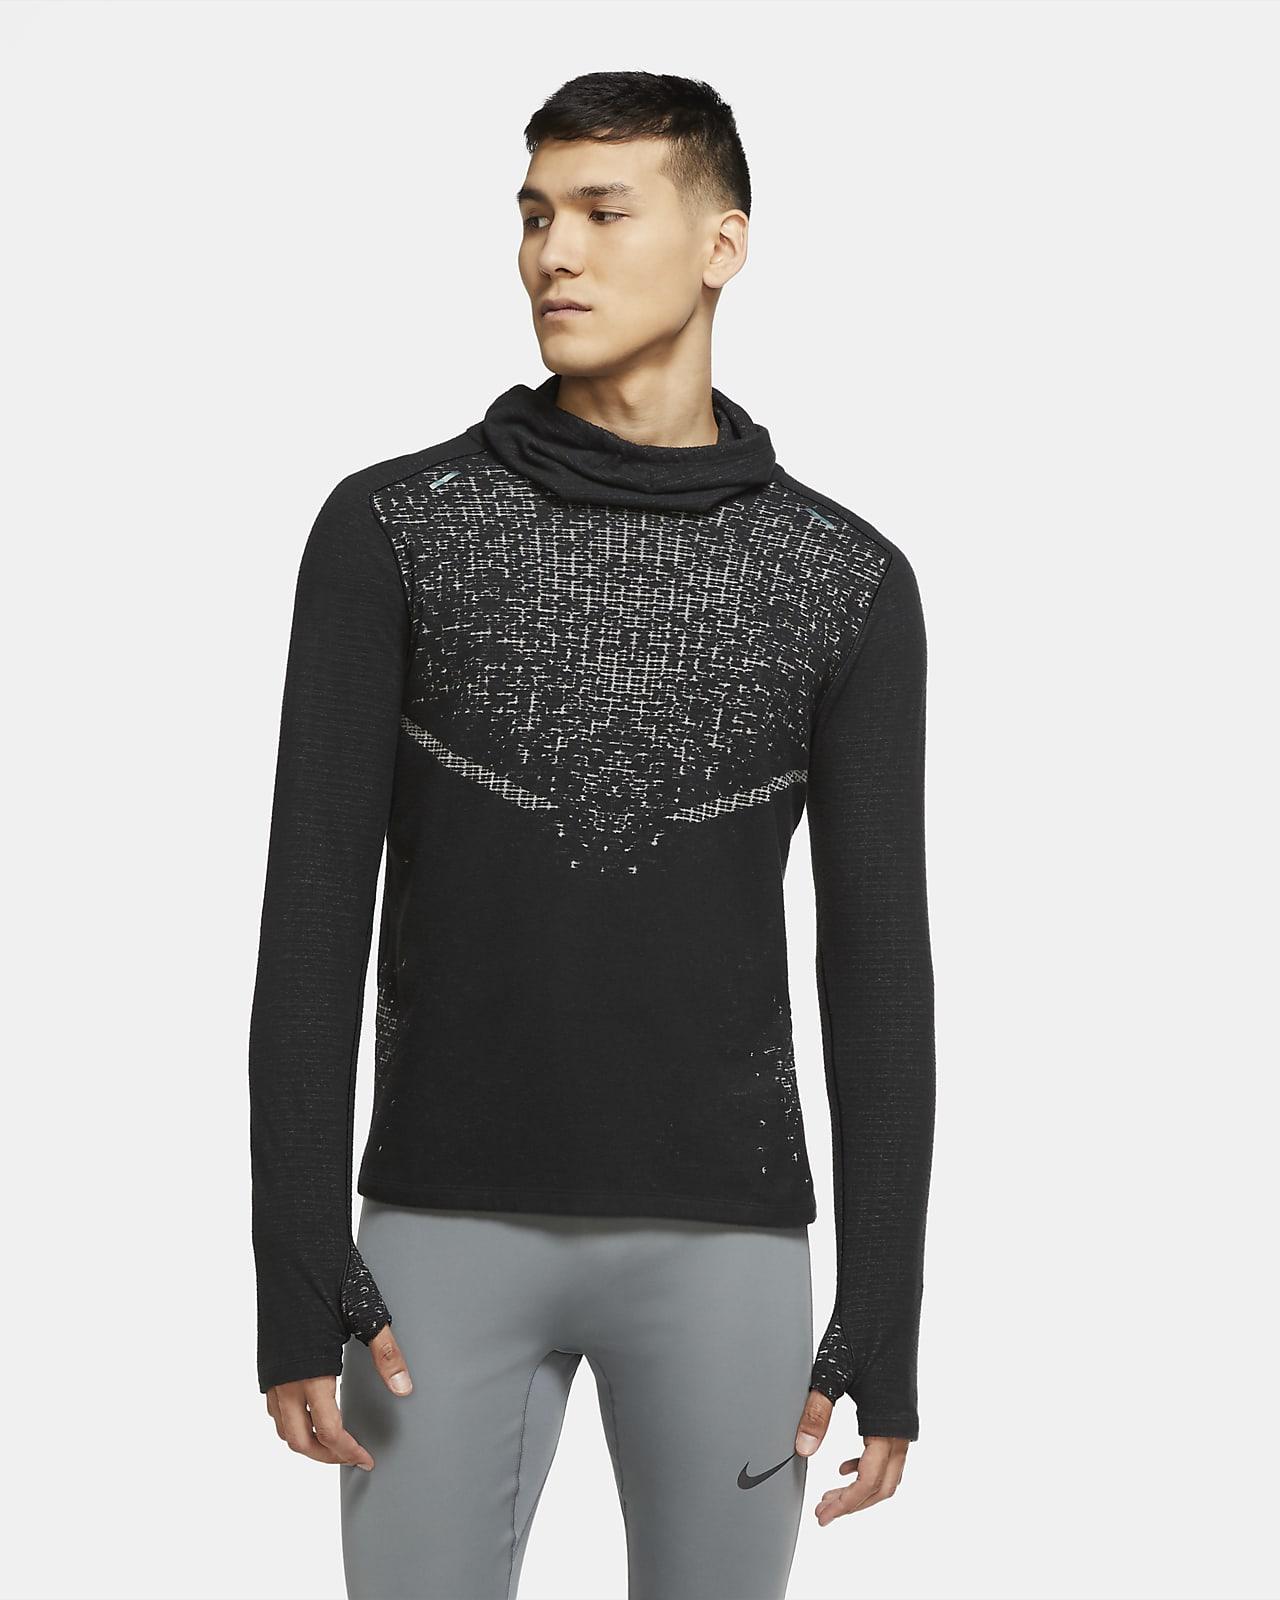 Nike Run Division Wooldorado Camiseta de running - Hombre